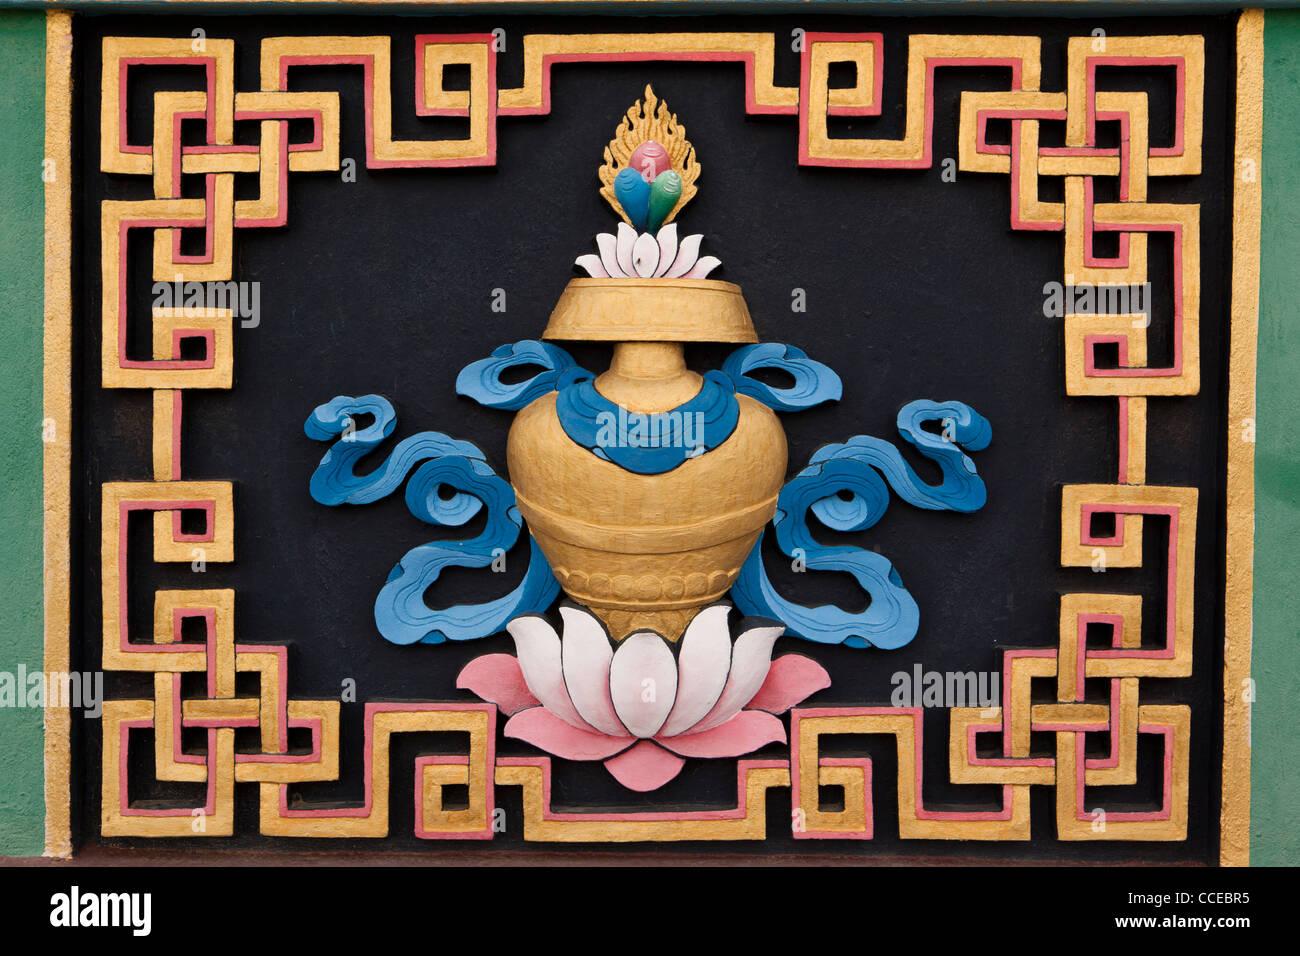 Indien, Arunachal Pradesh, Tawang, Khinmey Nyingma Kloster, Schatz Vase, Kalasha, auspicious symbol Stockbild